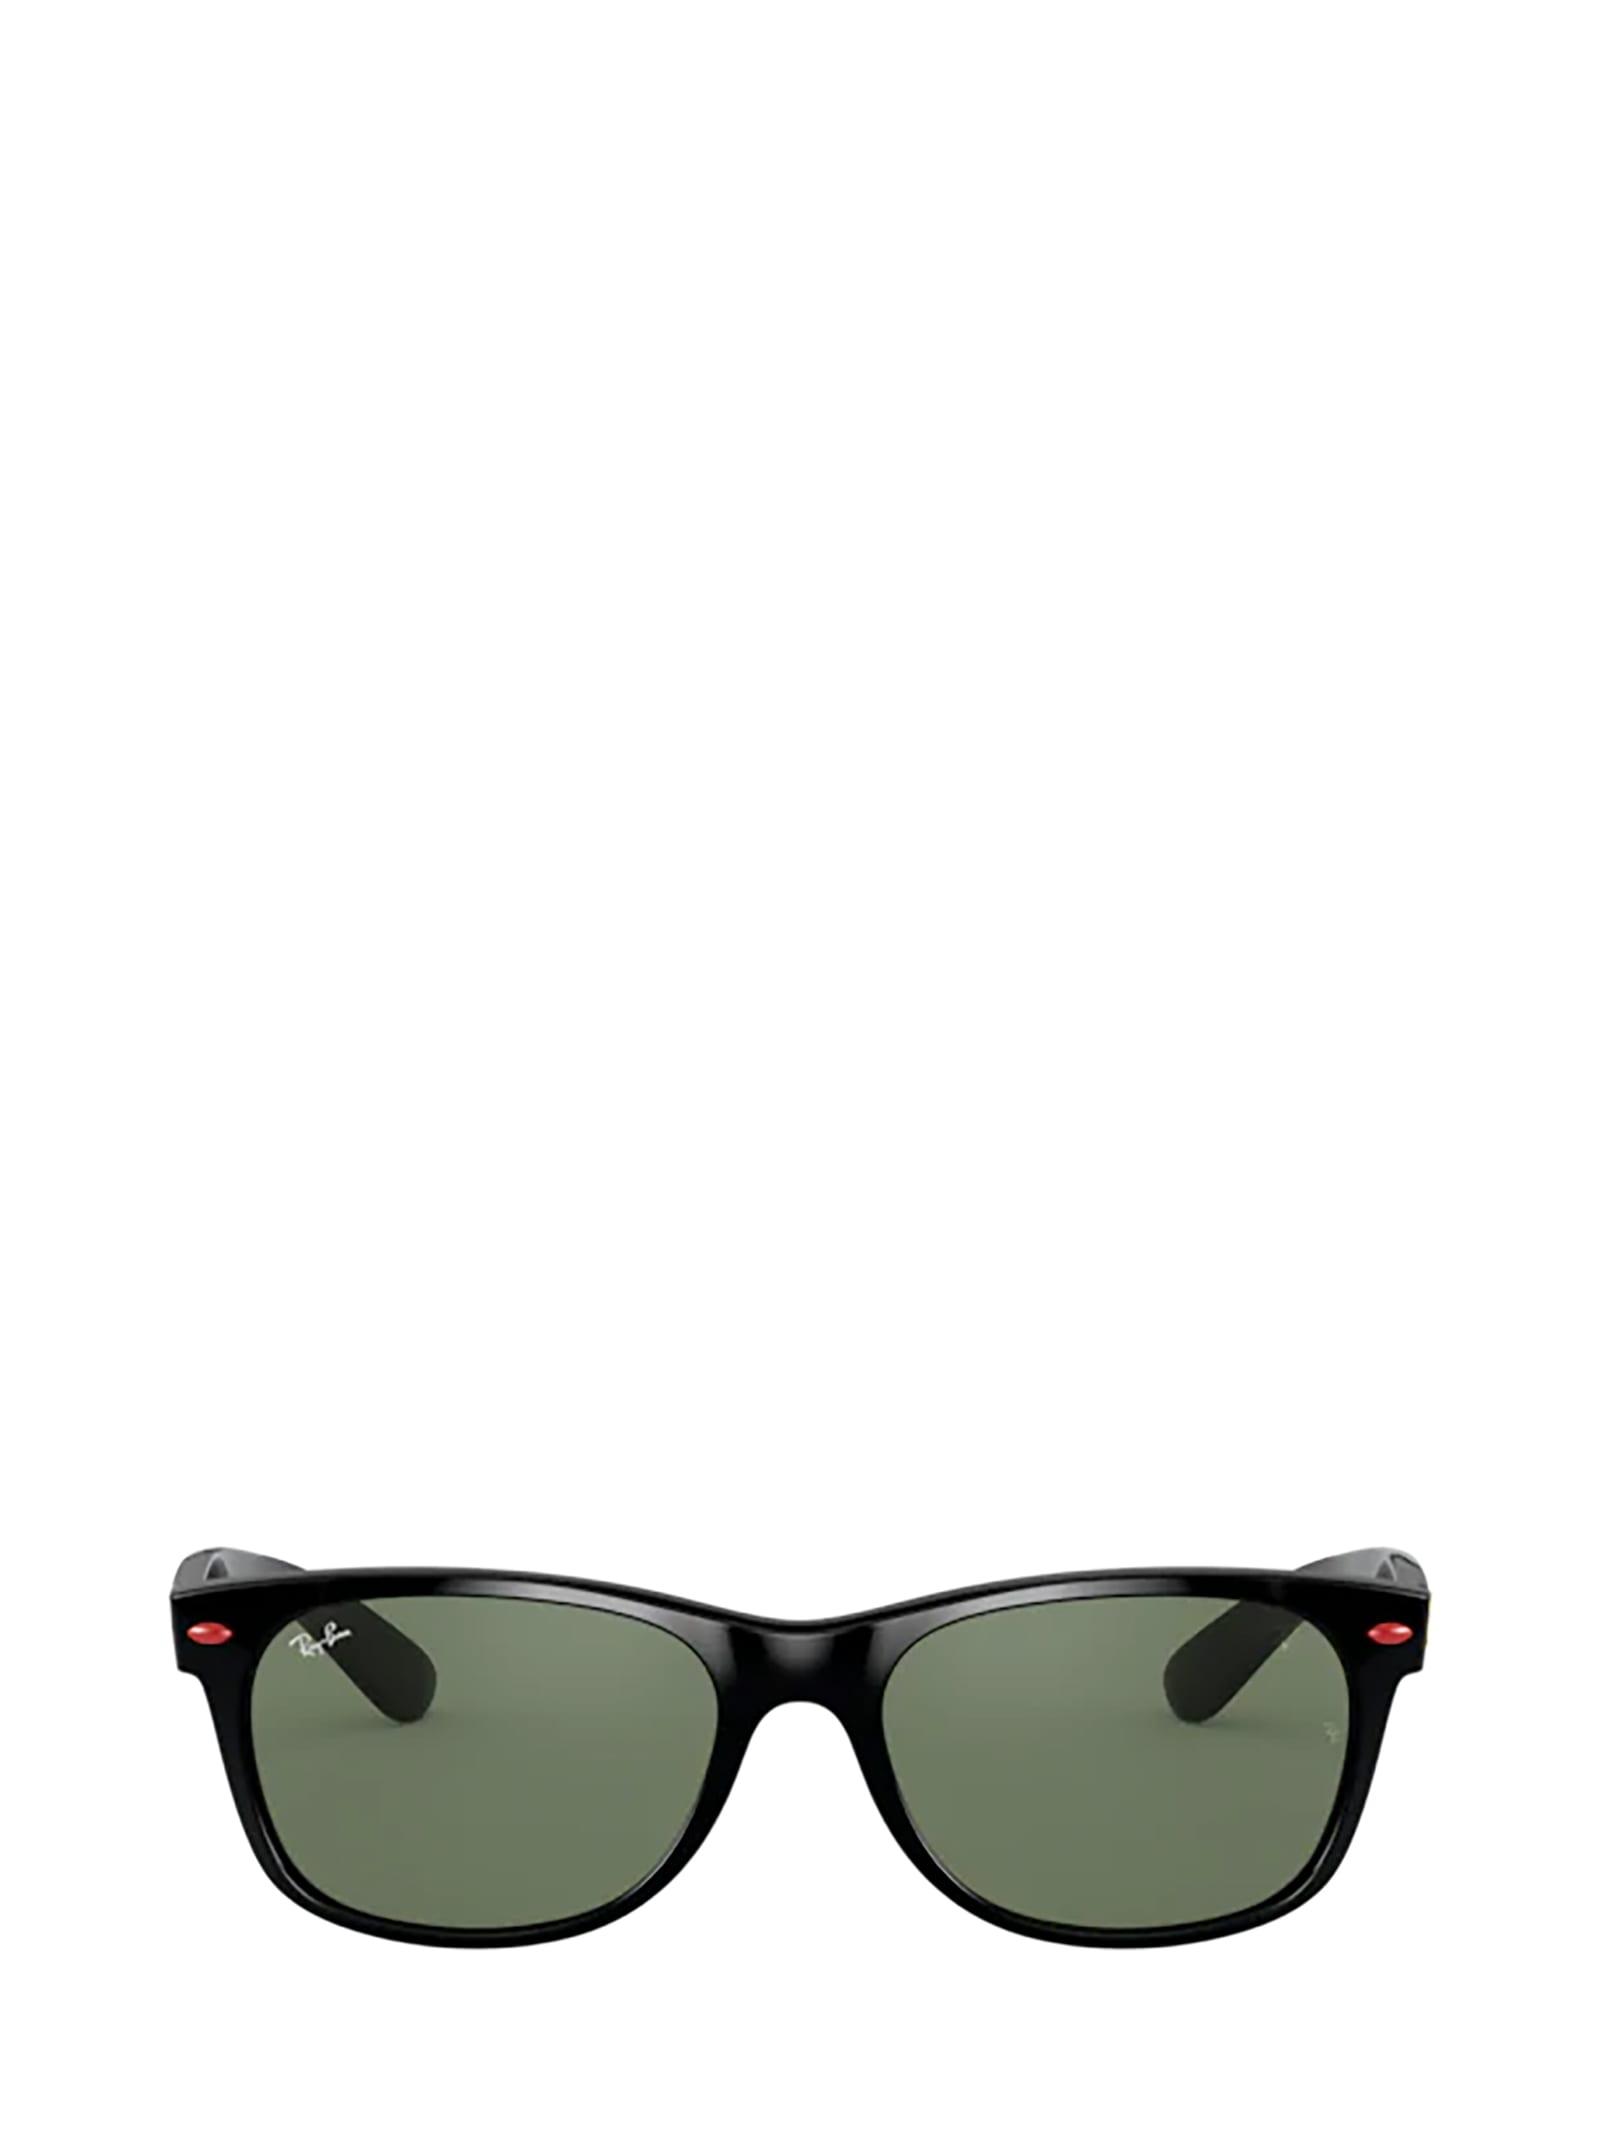 Ray-Ban Ray-ban Rb2132m Black Sunglasses